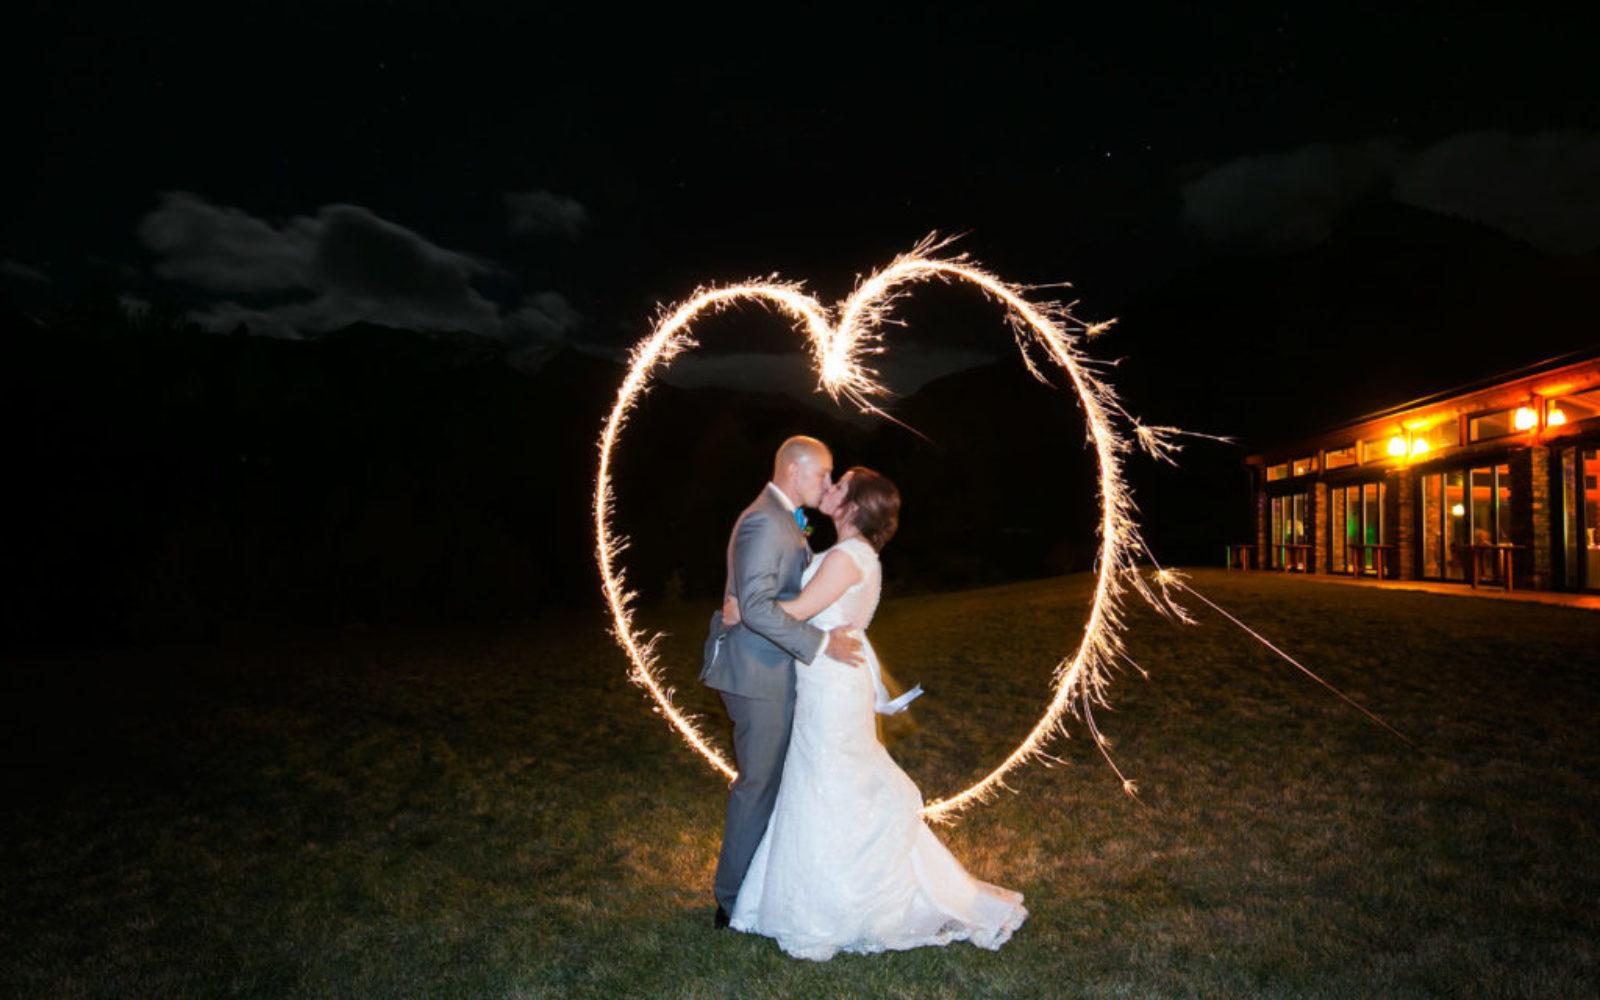 weddingphotographycoloradosprings_75-1024x640